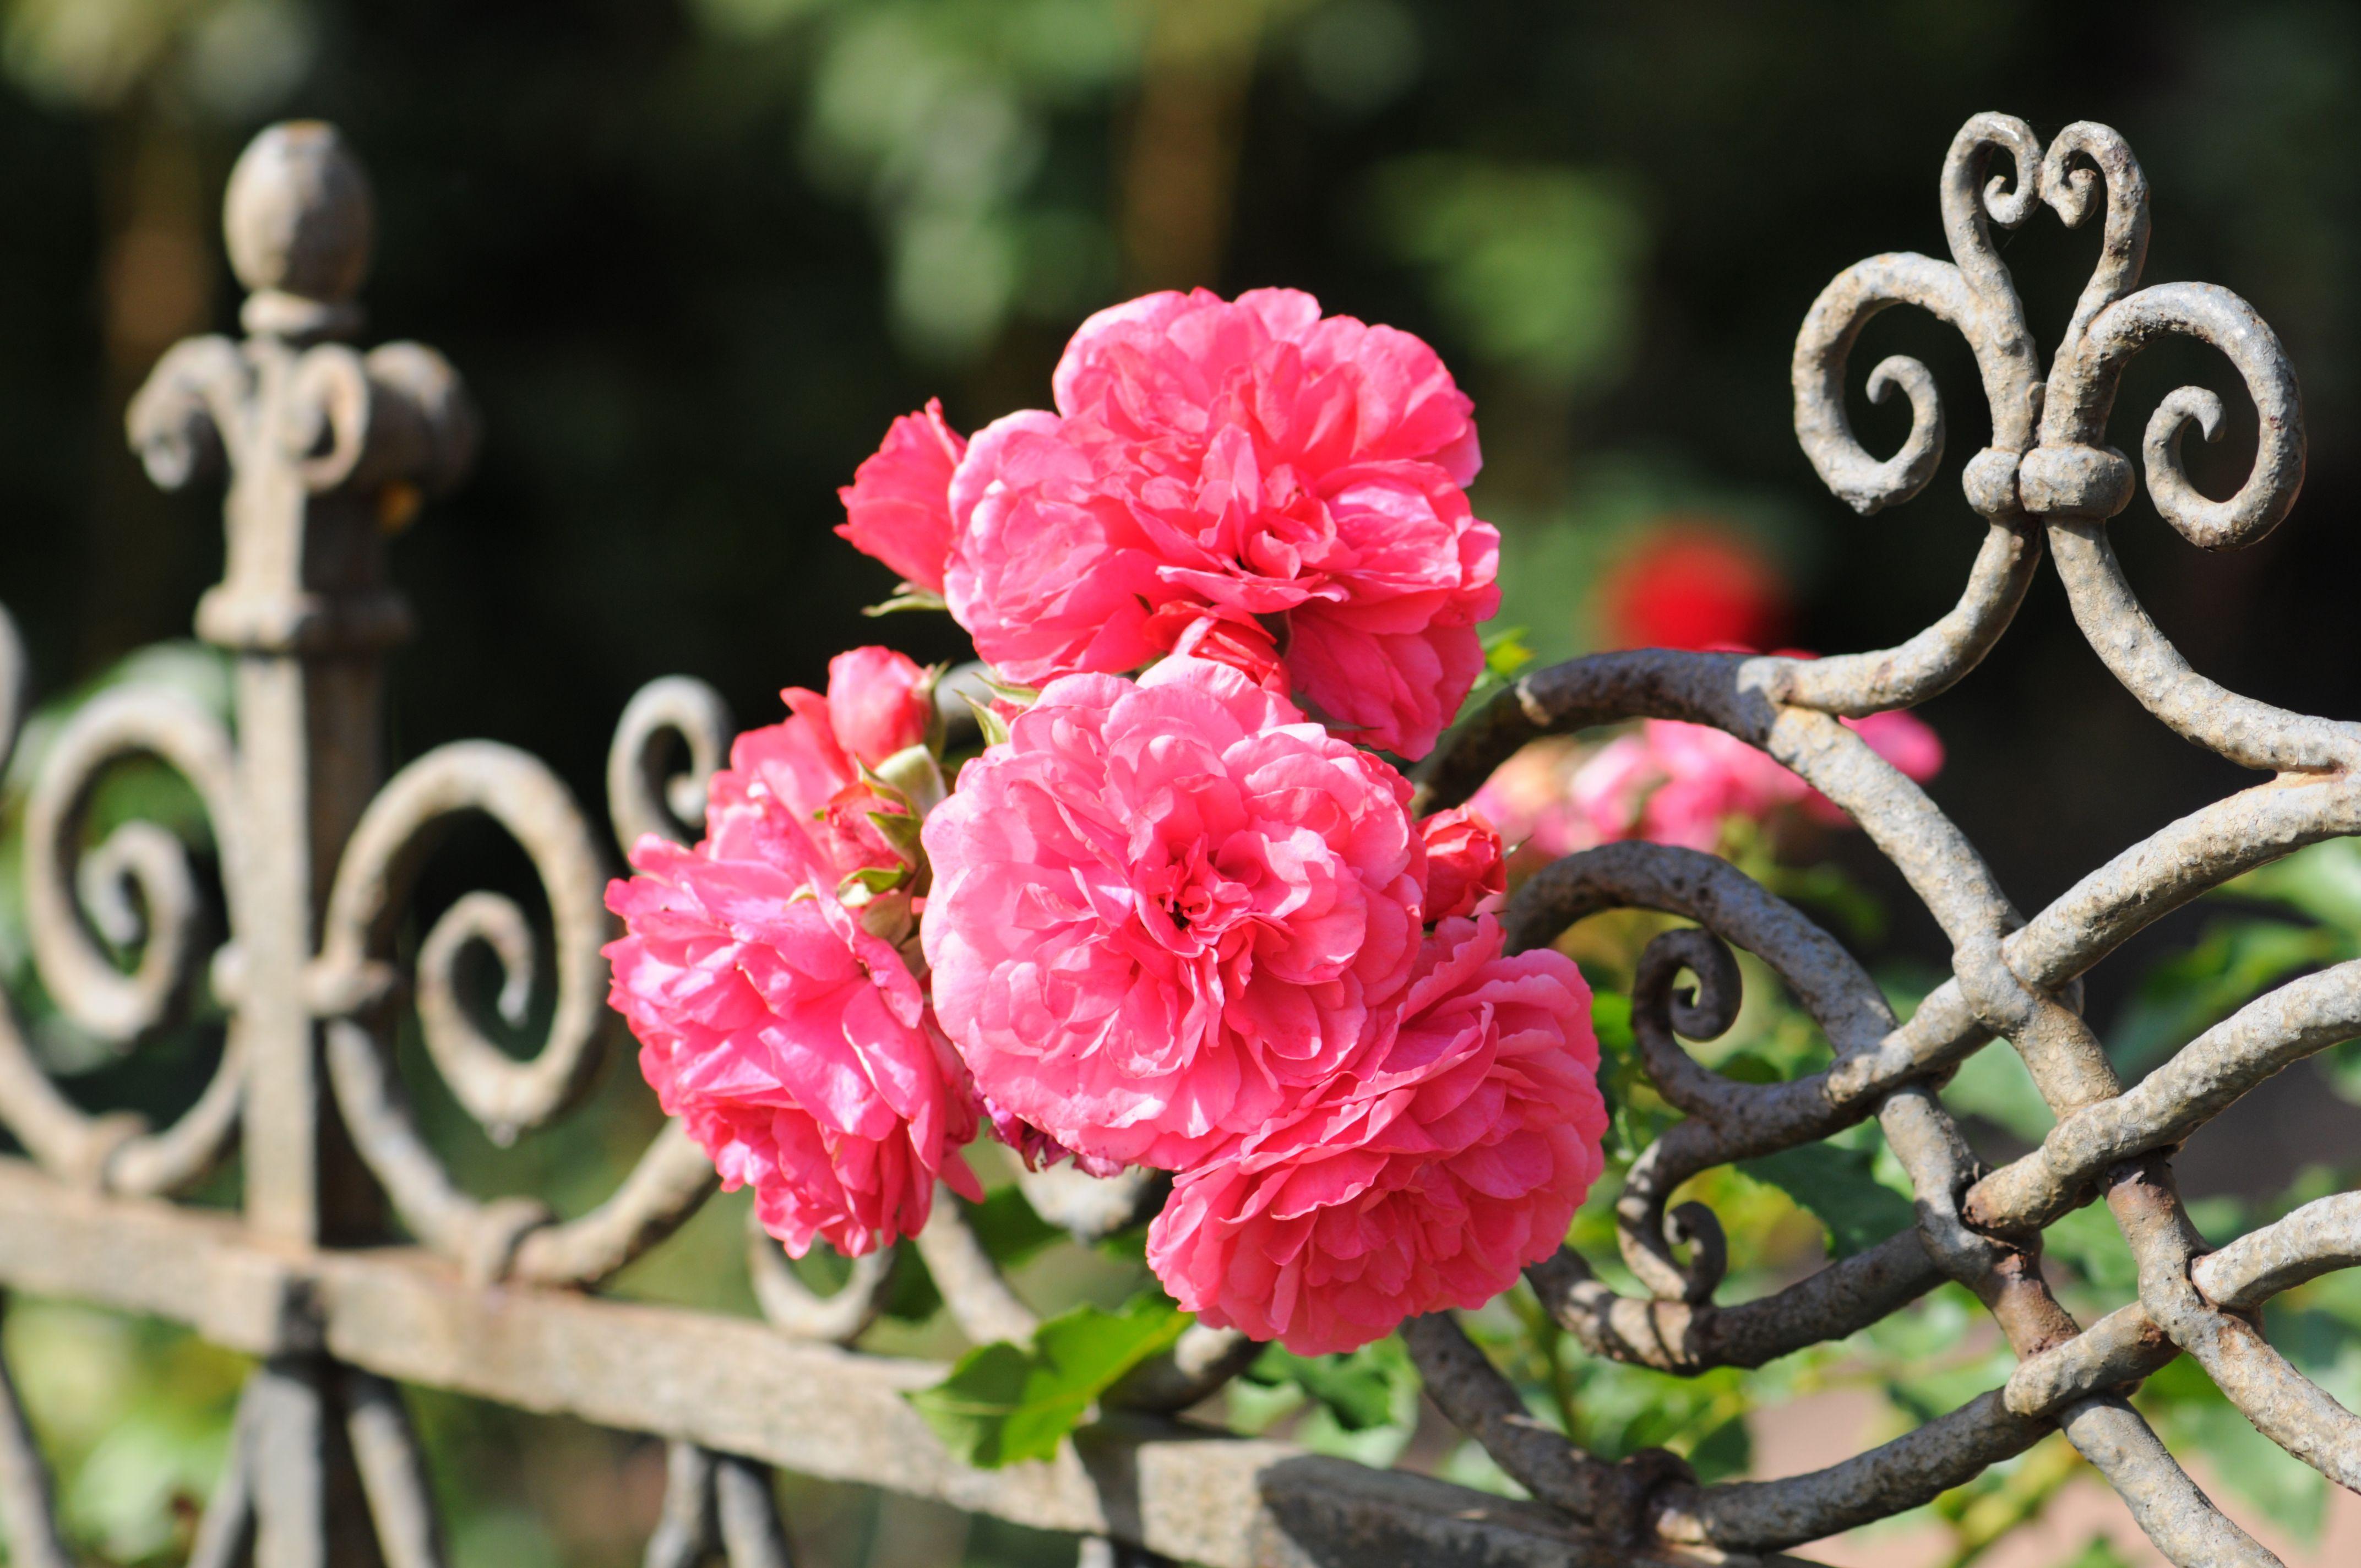 rosa stikkende rose på et gjerde